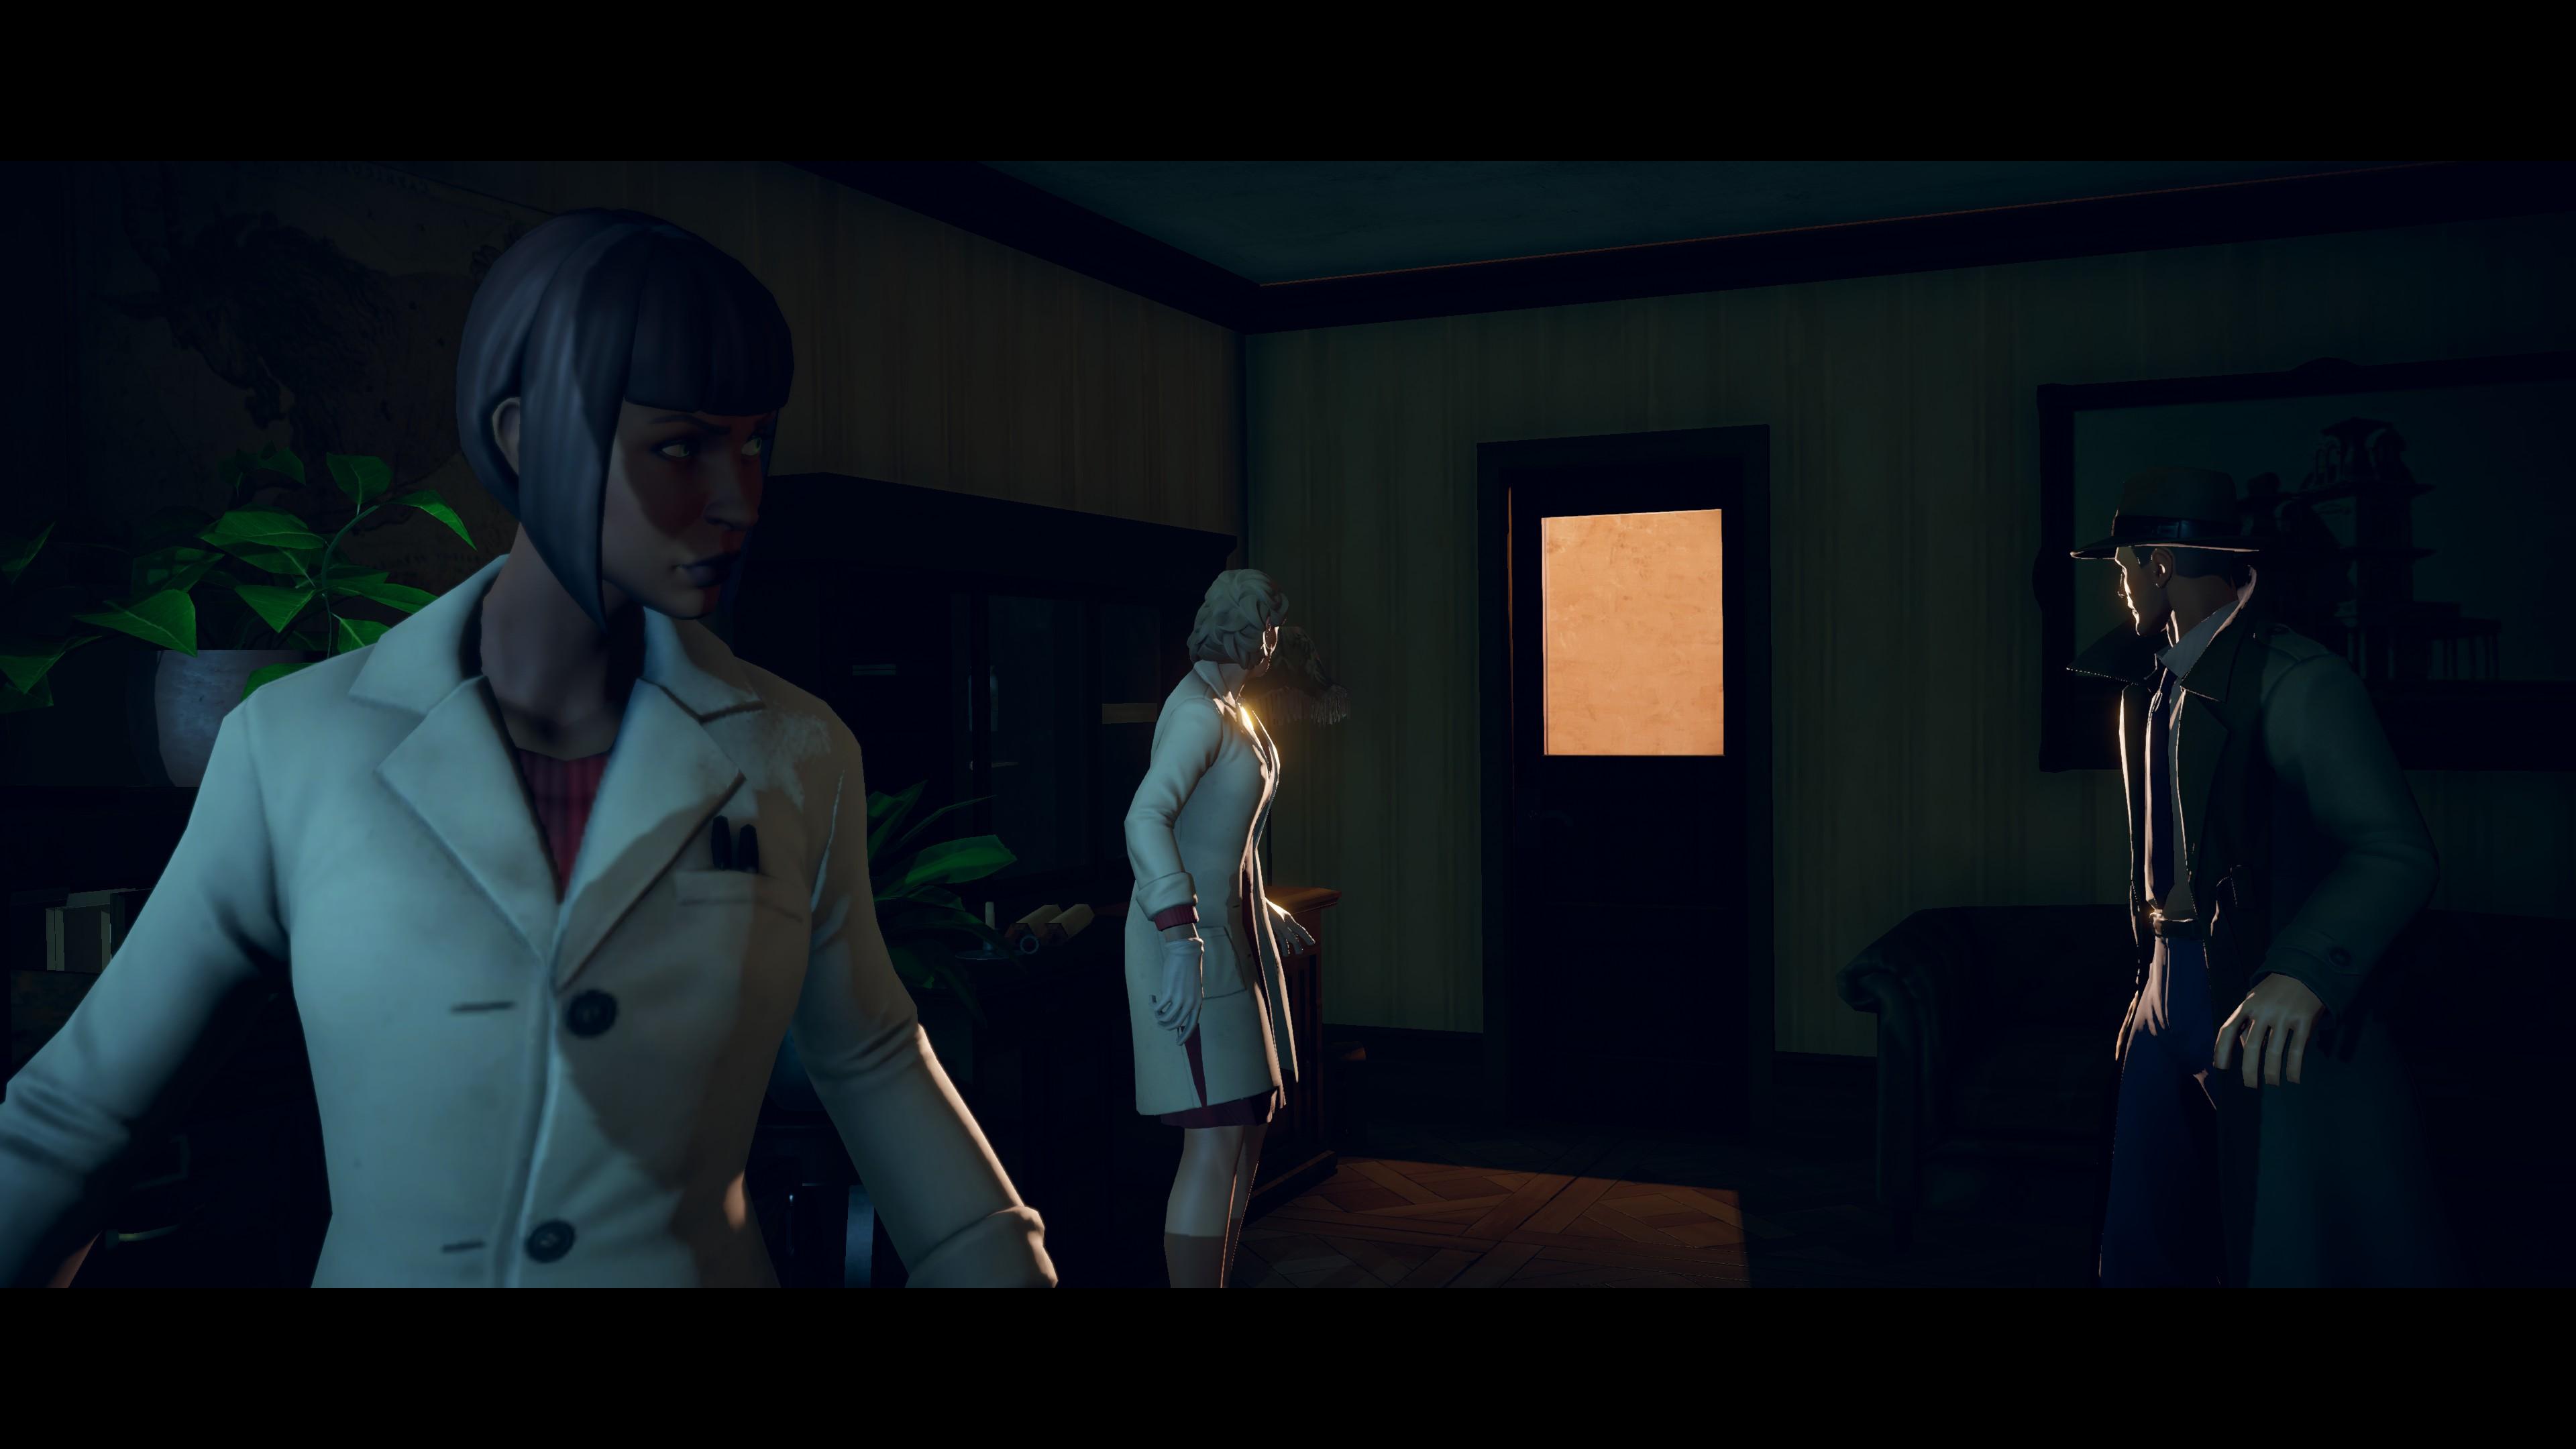 Arkham Horror  Mother's Embrace game screenshot.